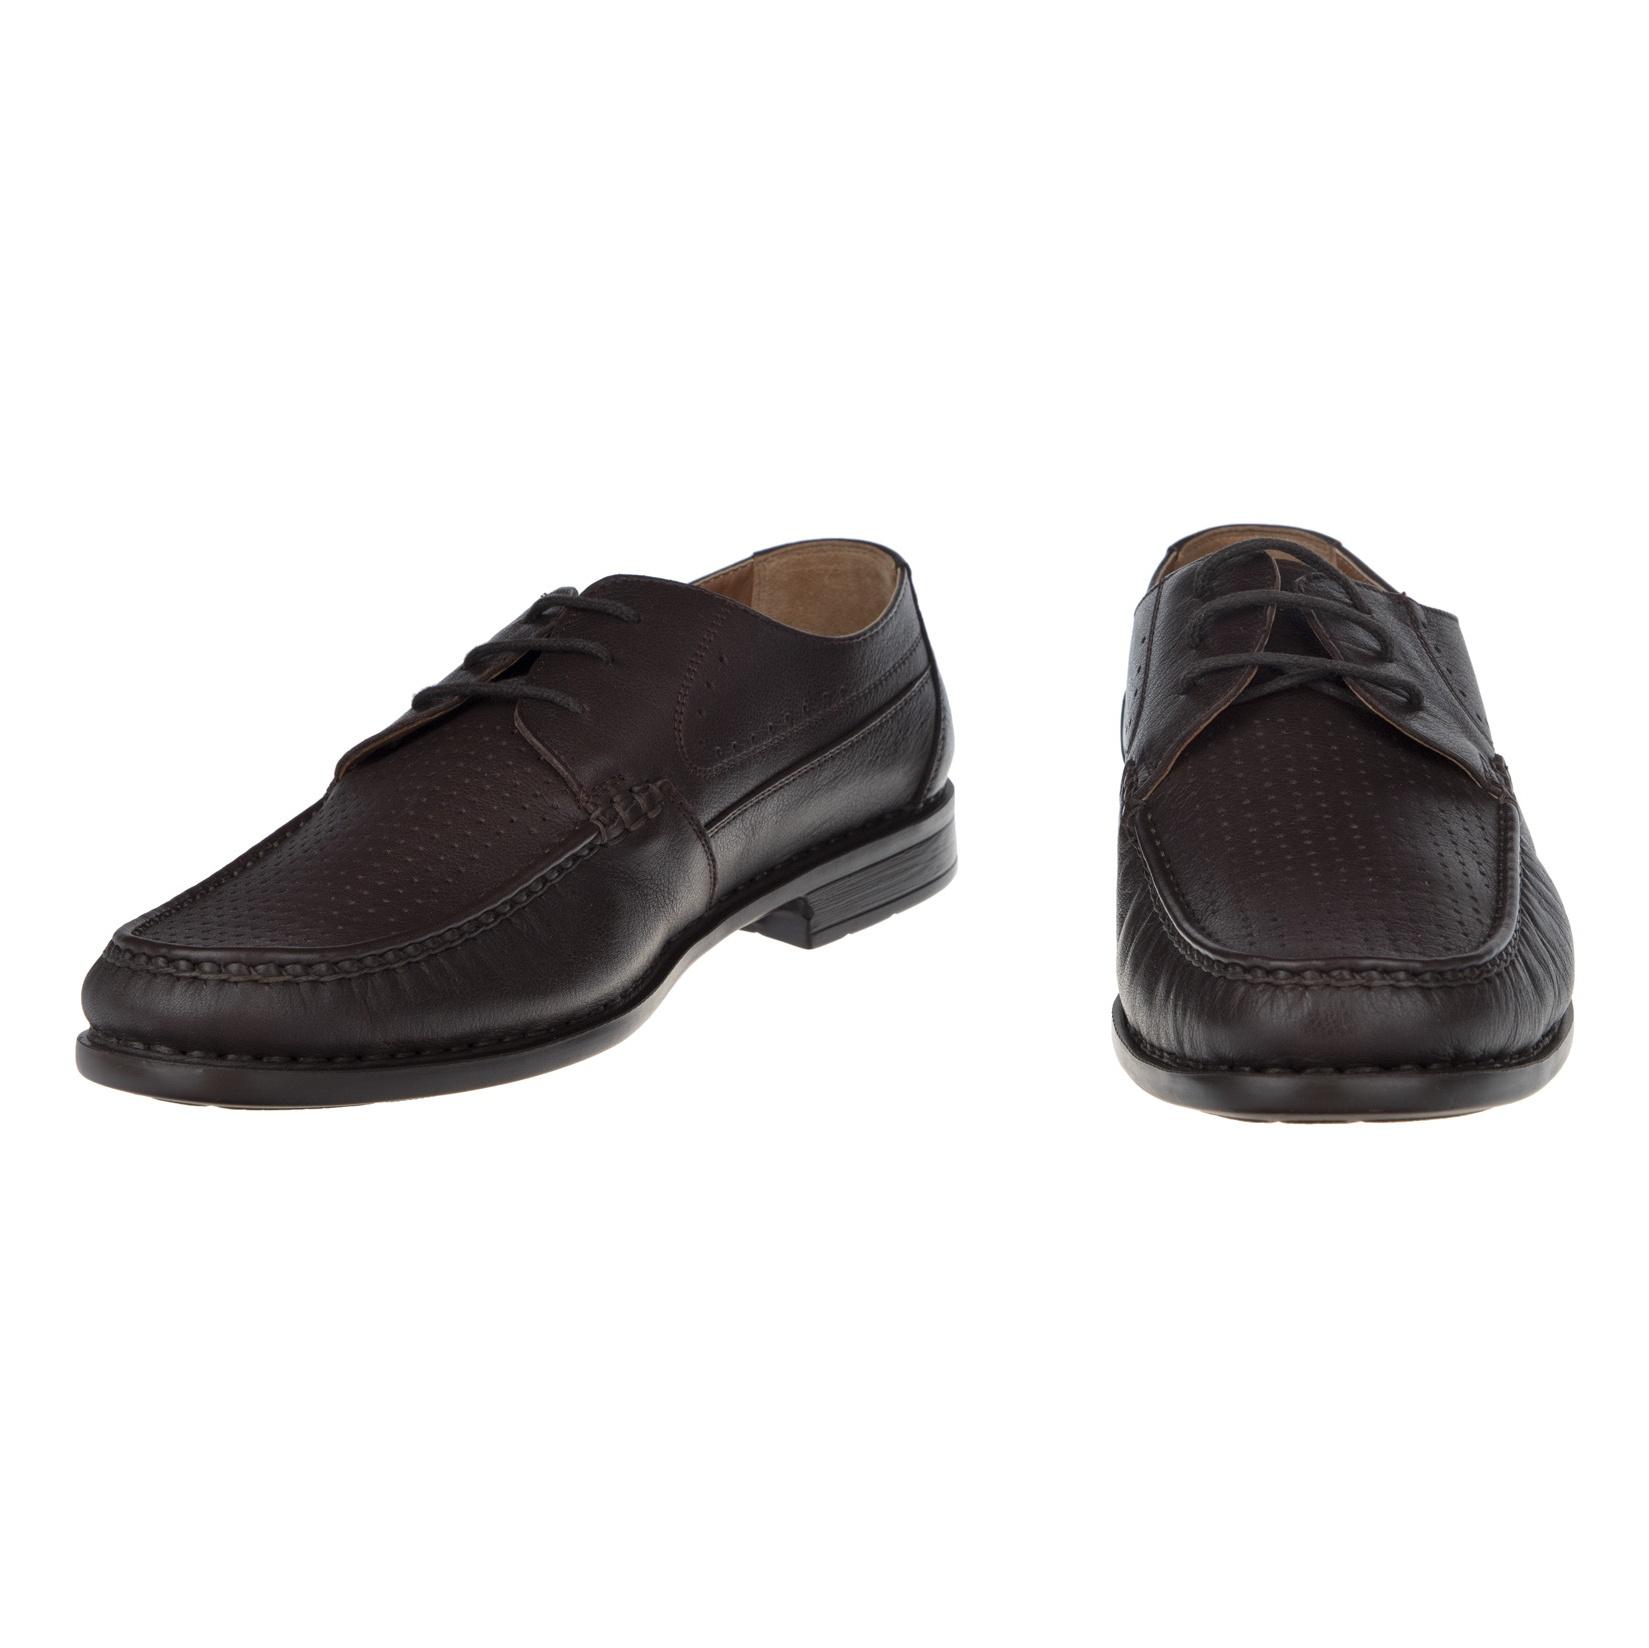 کفش روزمره مردانه پولاریس مدل 100296904-103 - قهوه ای - 5